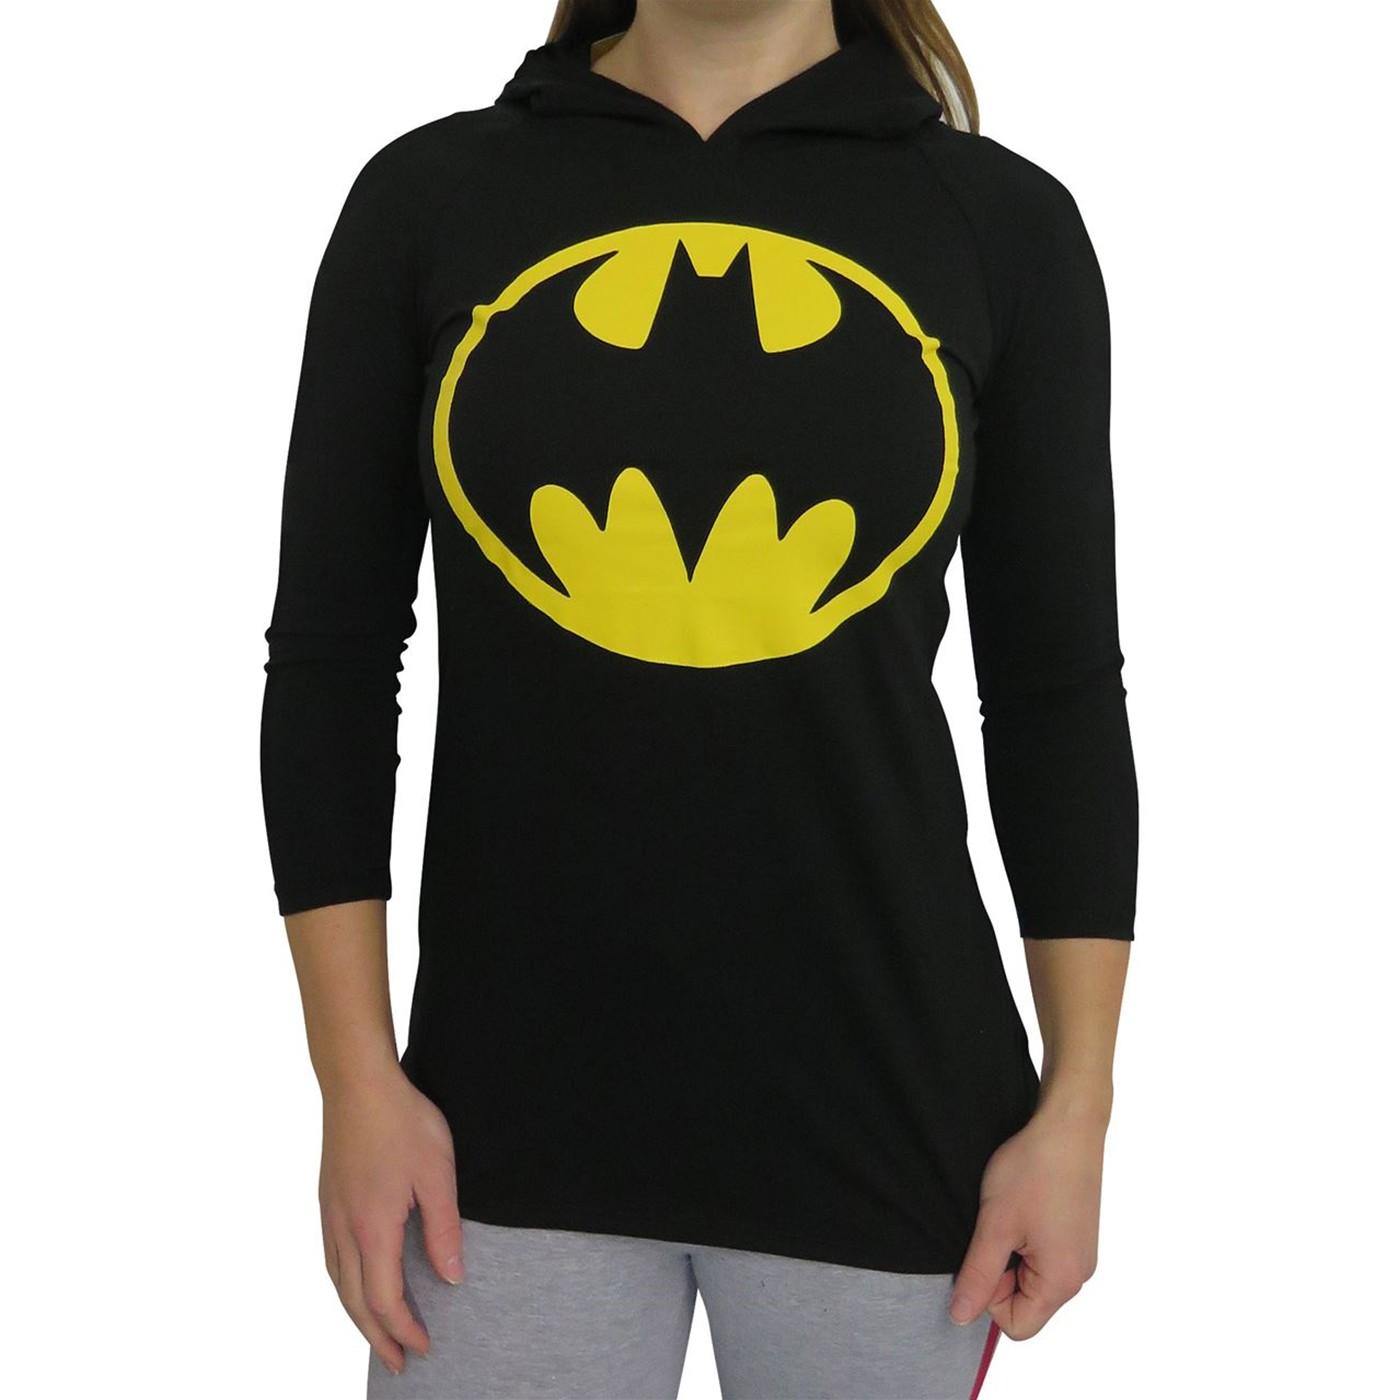 Batman Juniors/' Women Gray and Black Graphic Long Sleeve Sweatshirt Winter RK